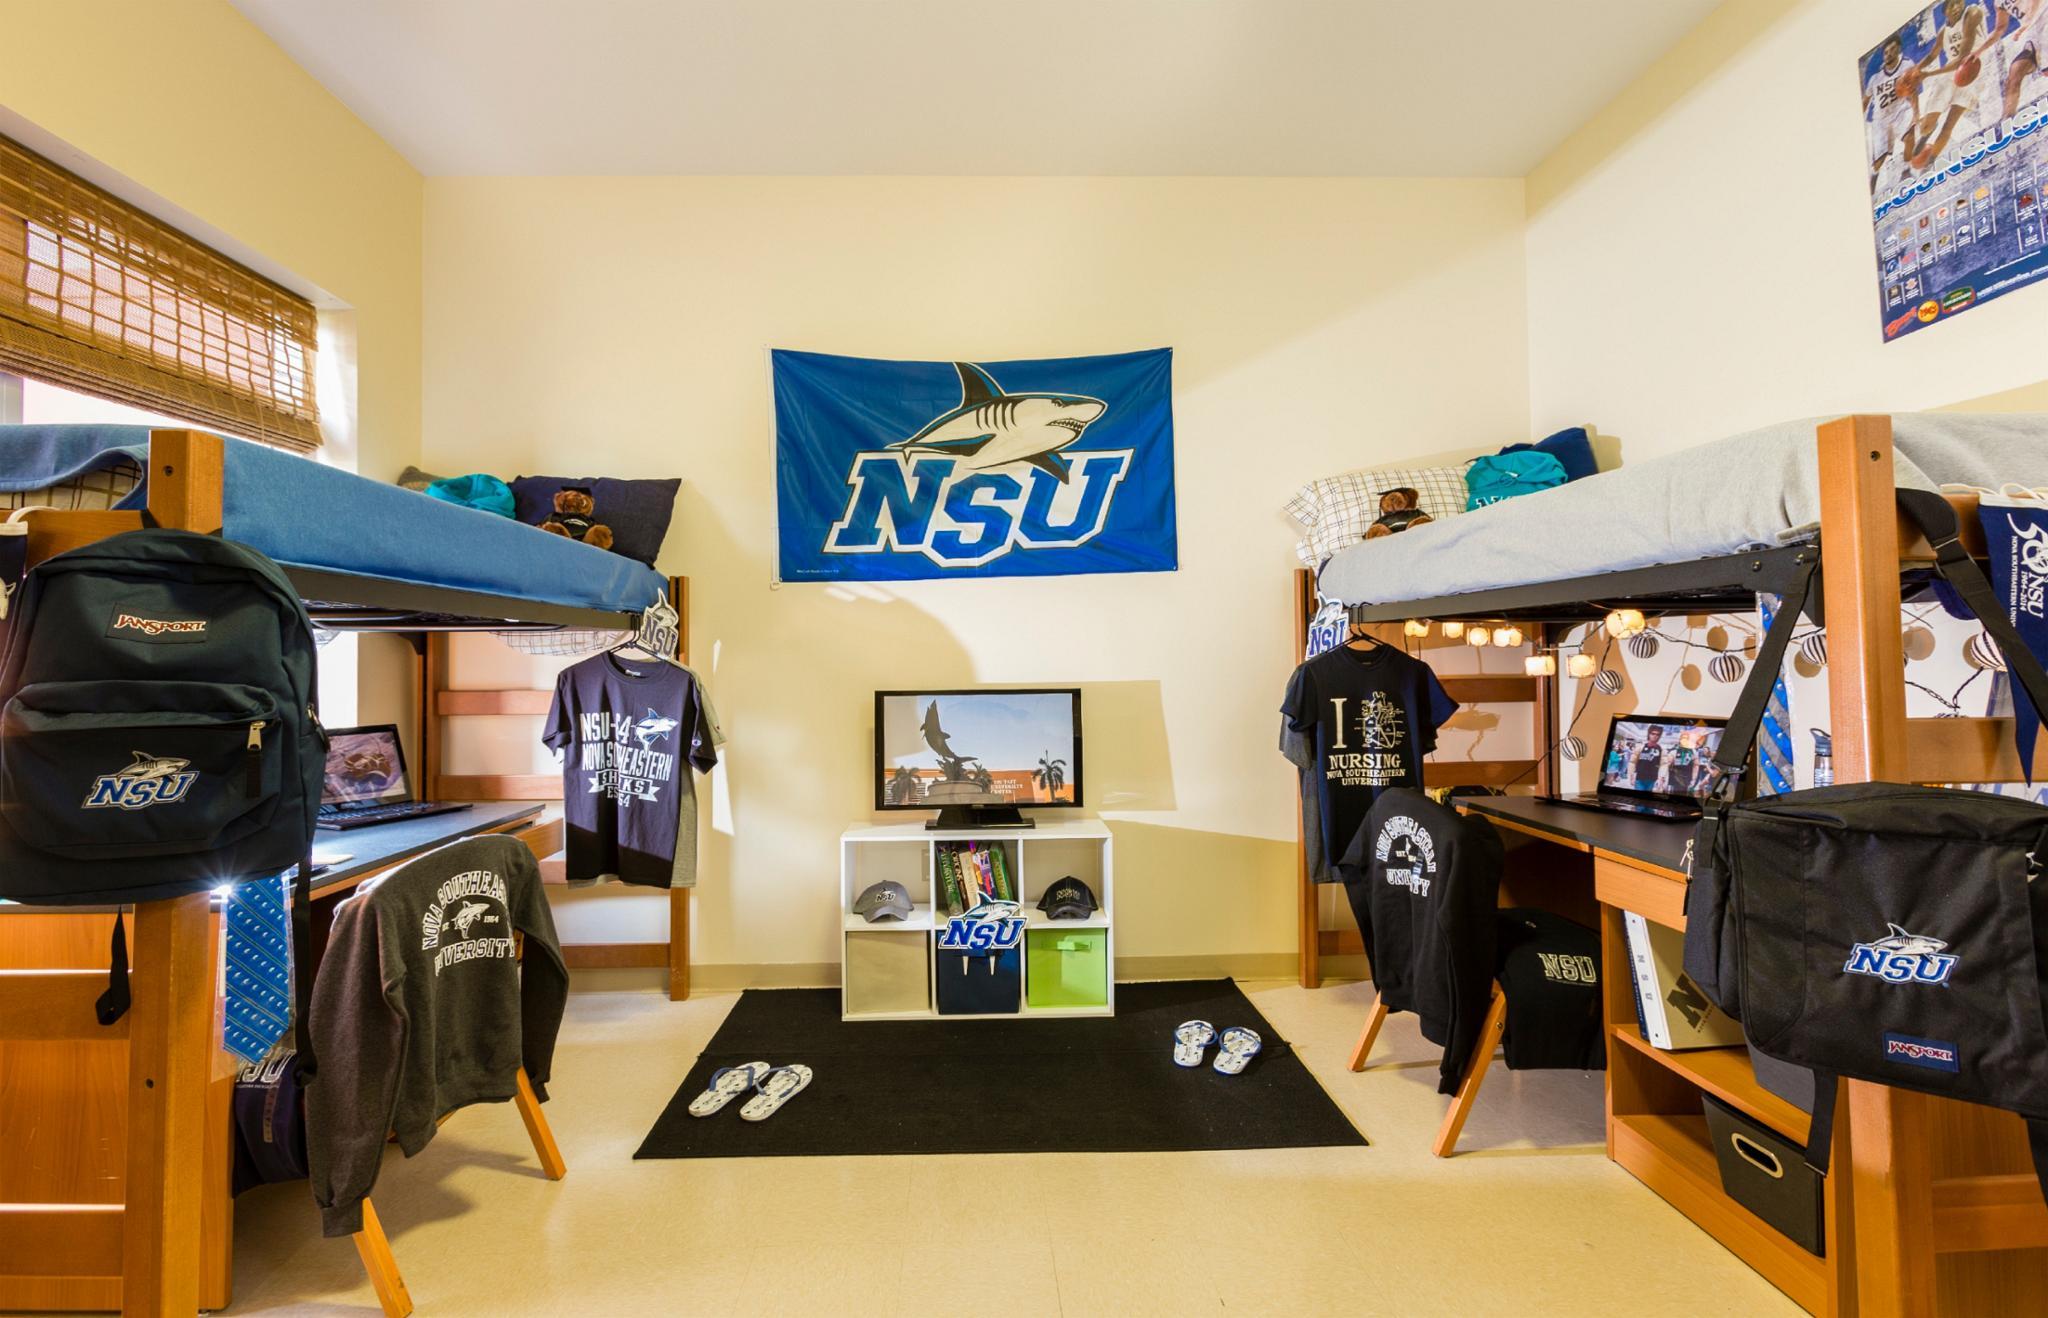 Nova Southeastern University Rooms For Rent